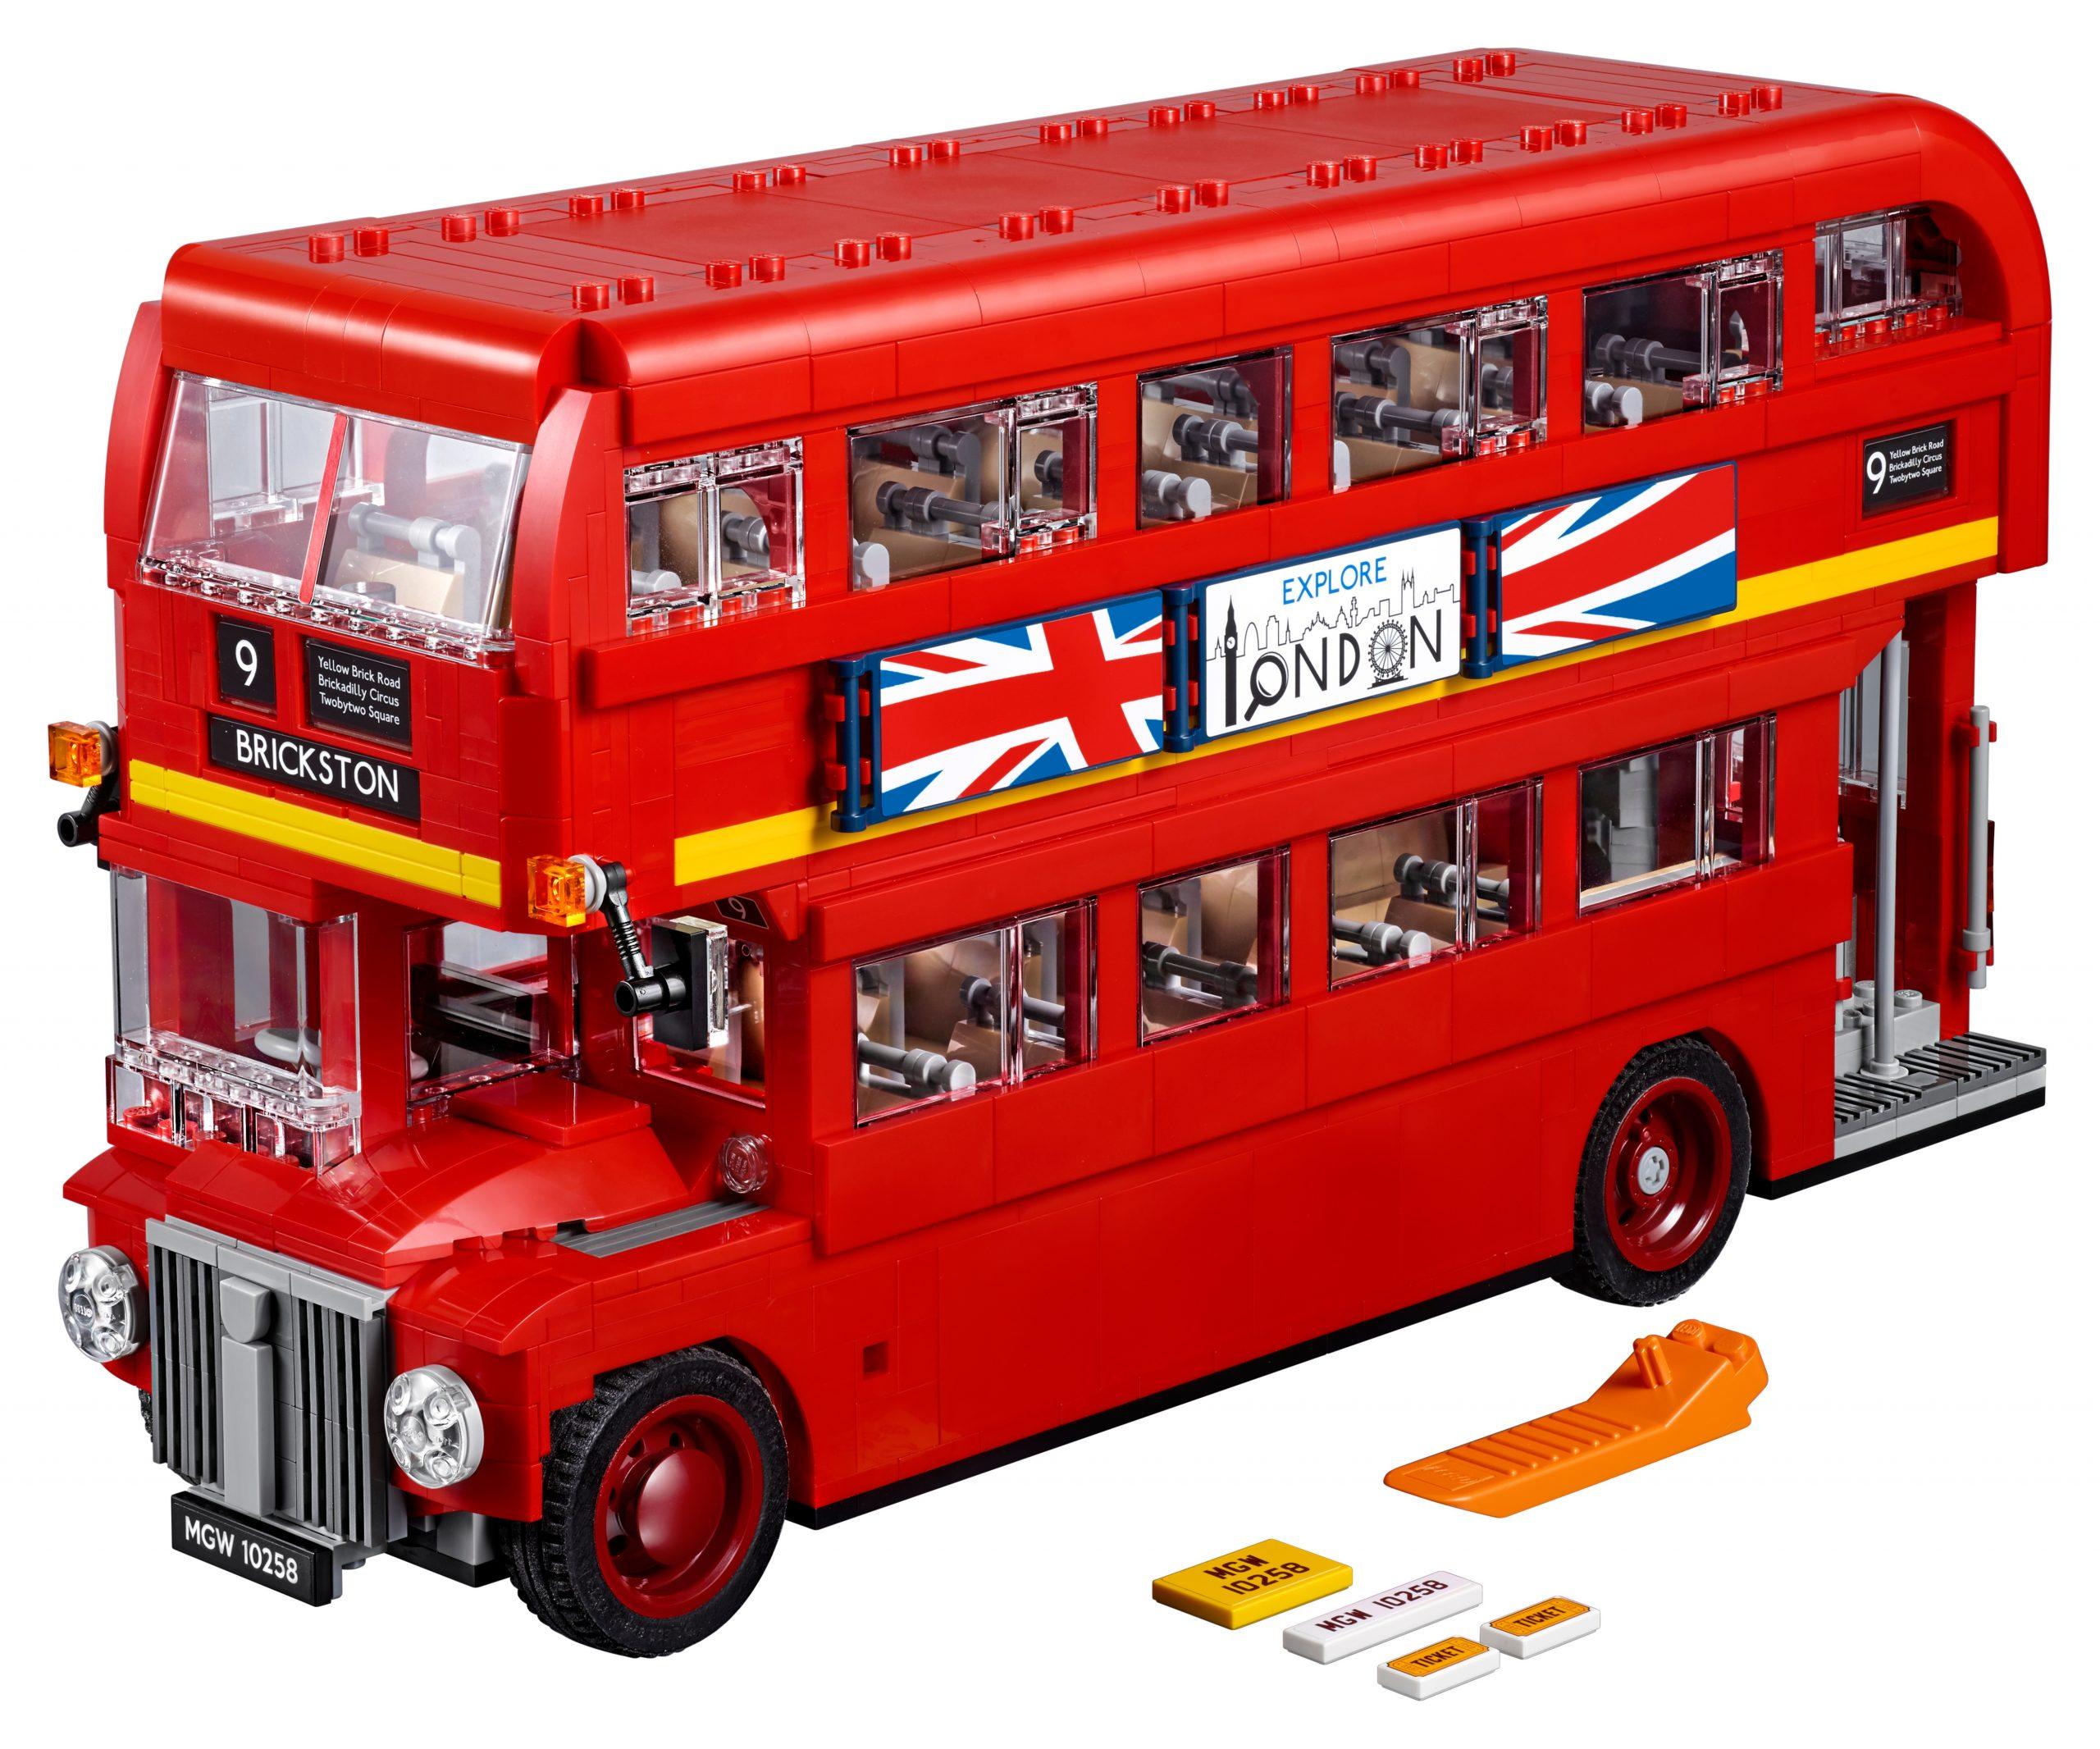 lego londense bus 10258 scaled